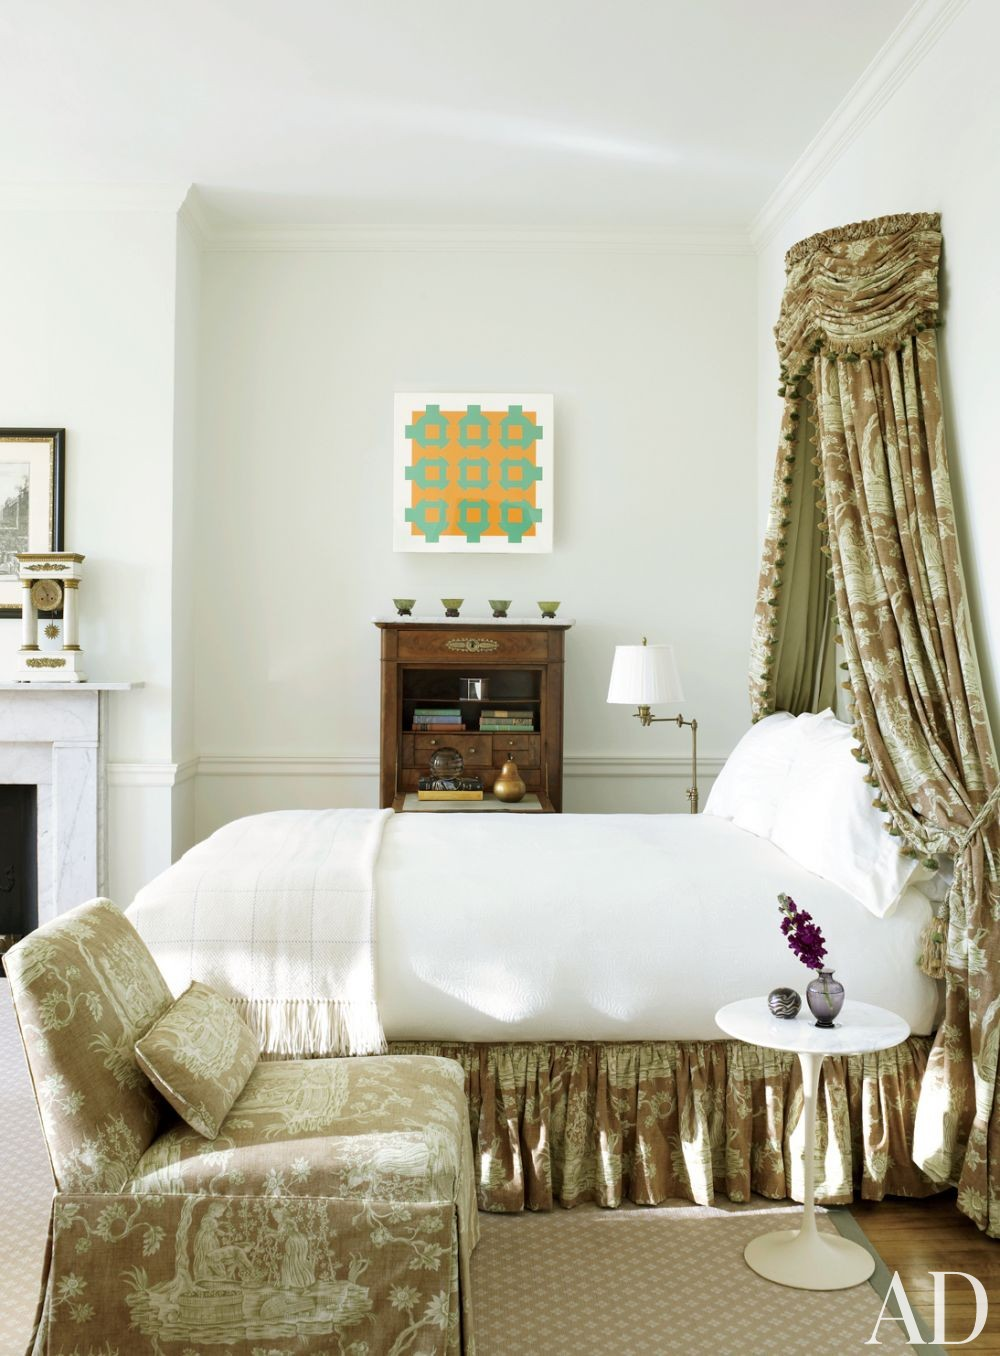 Traditional Bedroom by Thomas Jayne Studio in Philadelphia, Pennsylvania